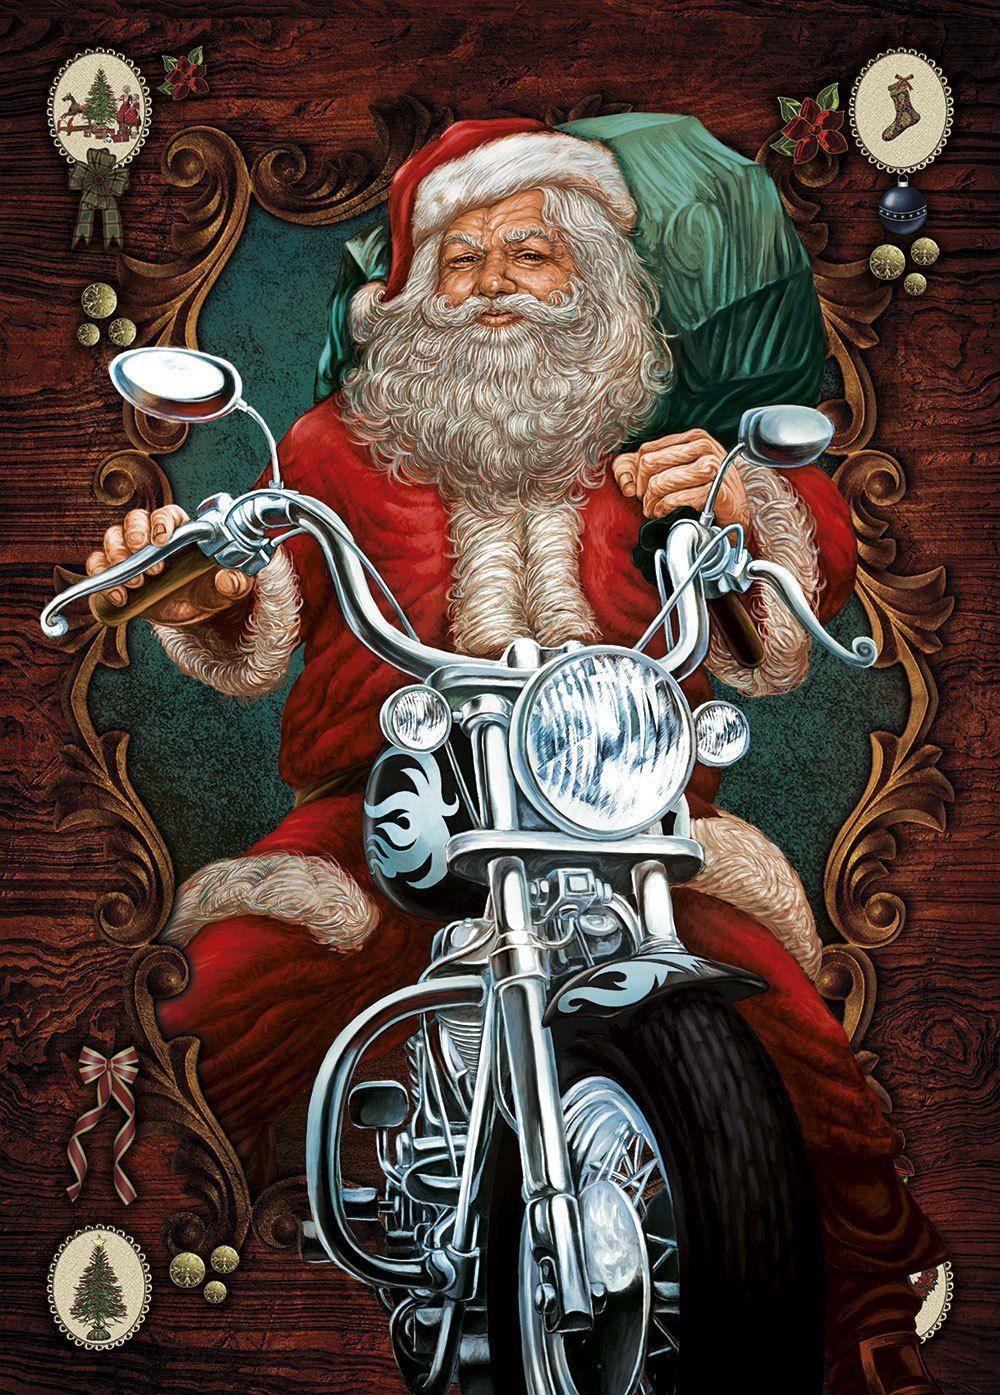 Santa Claus greeting cards - Biker Santa   Biker Life and Travels ...